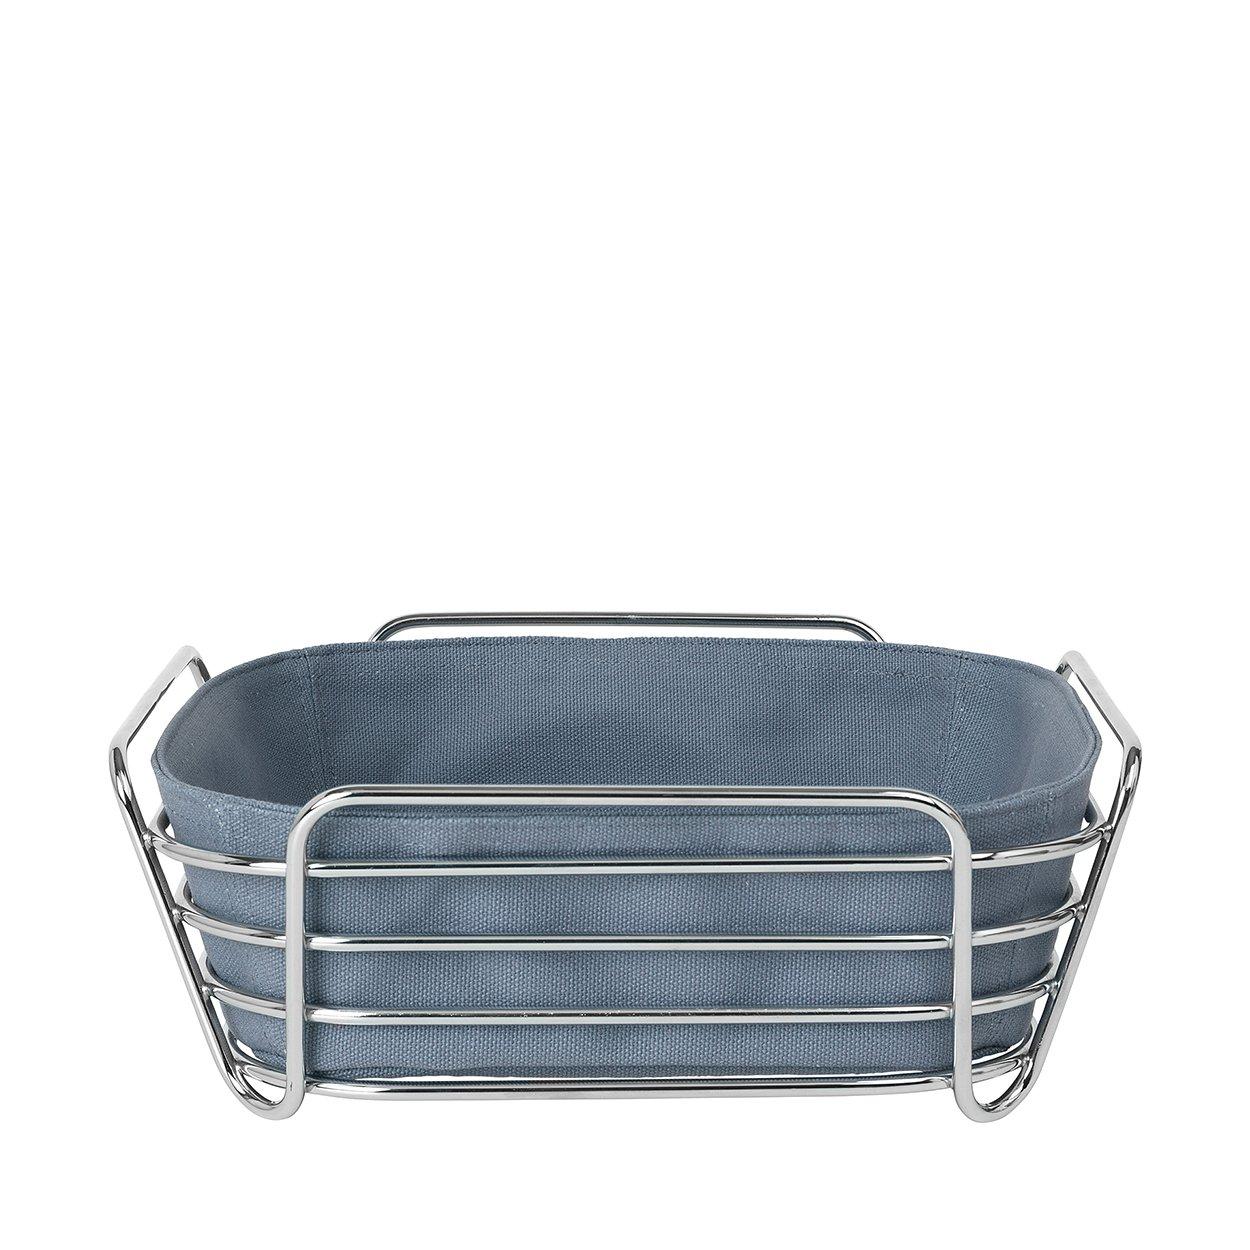 Delara Bread Basket Large 10'' x 10'', Flint Stone